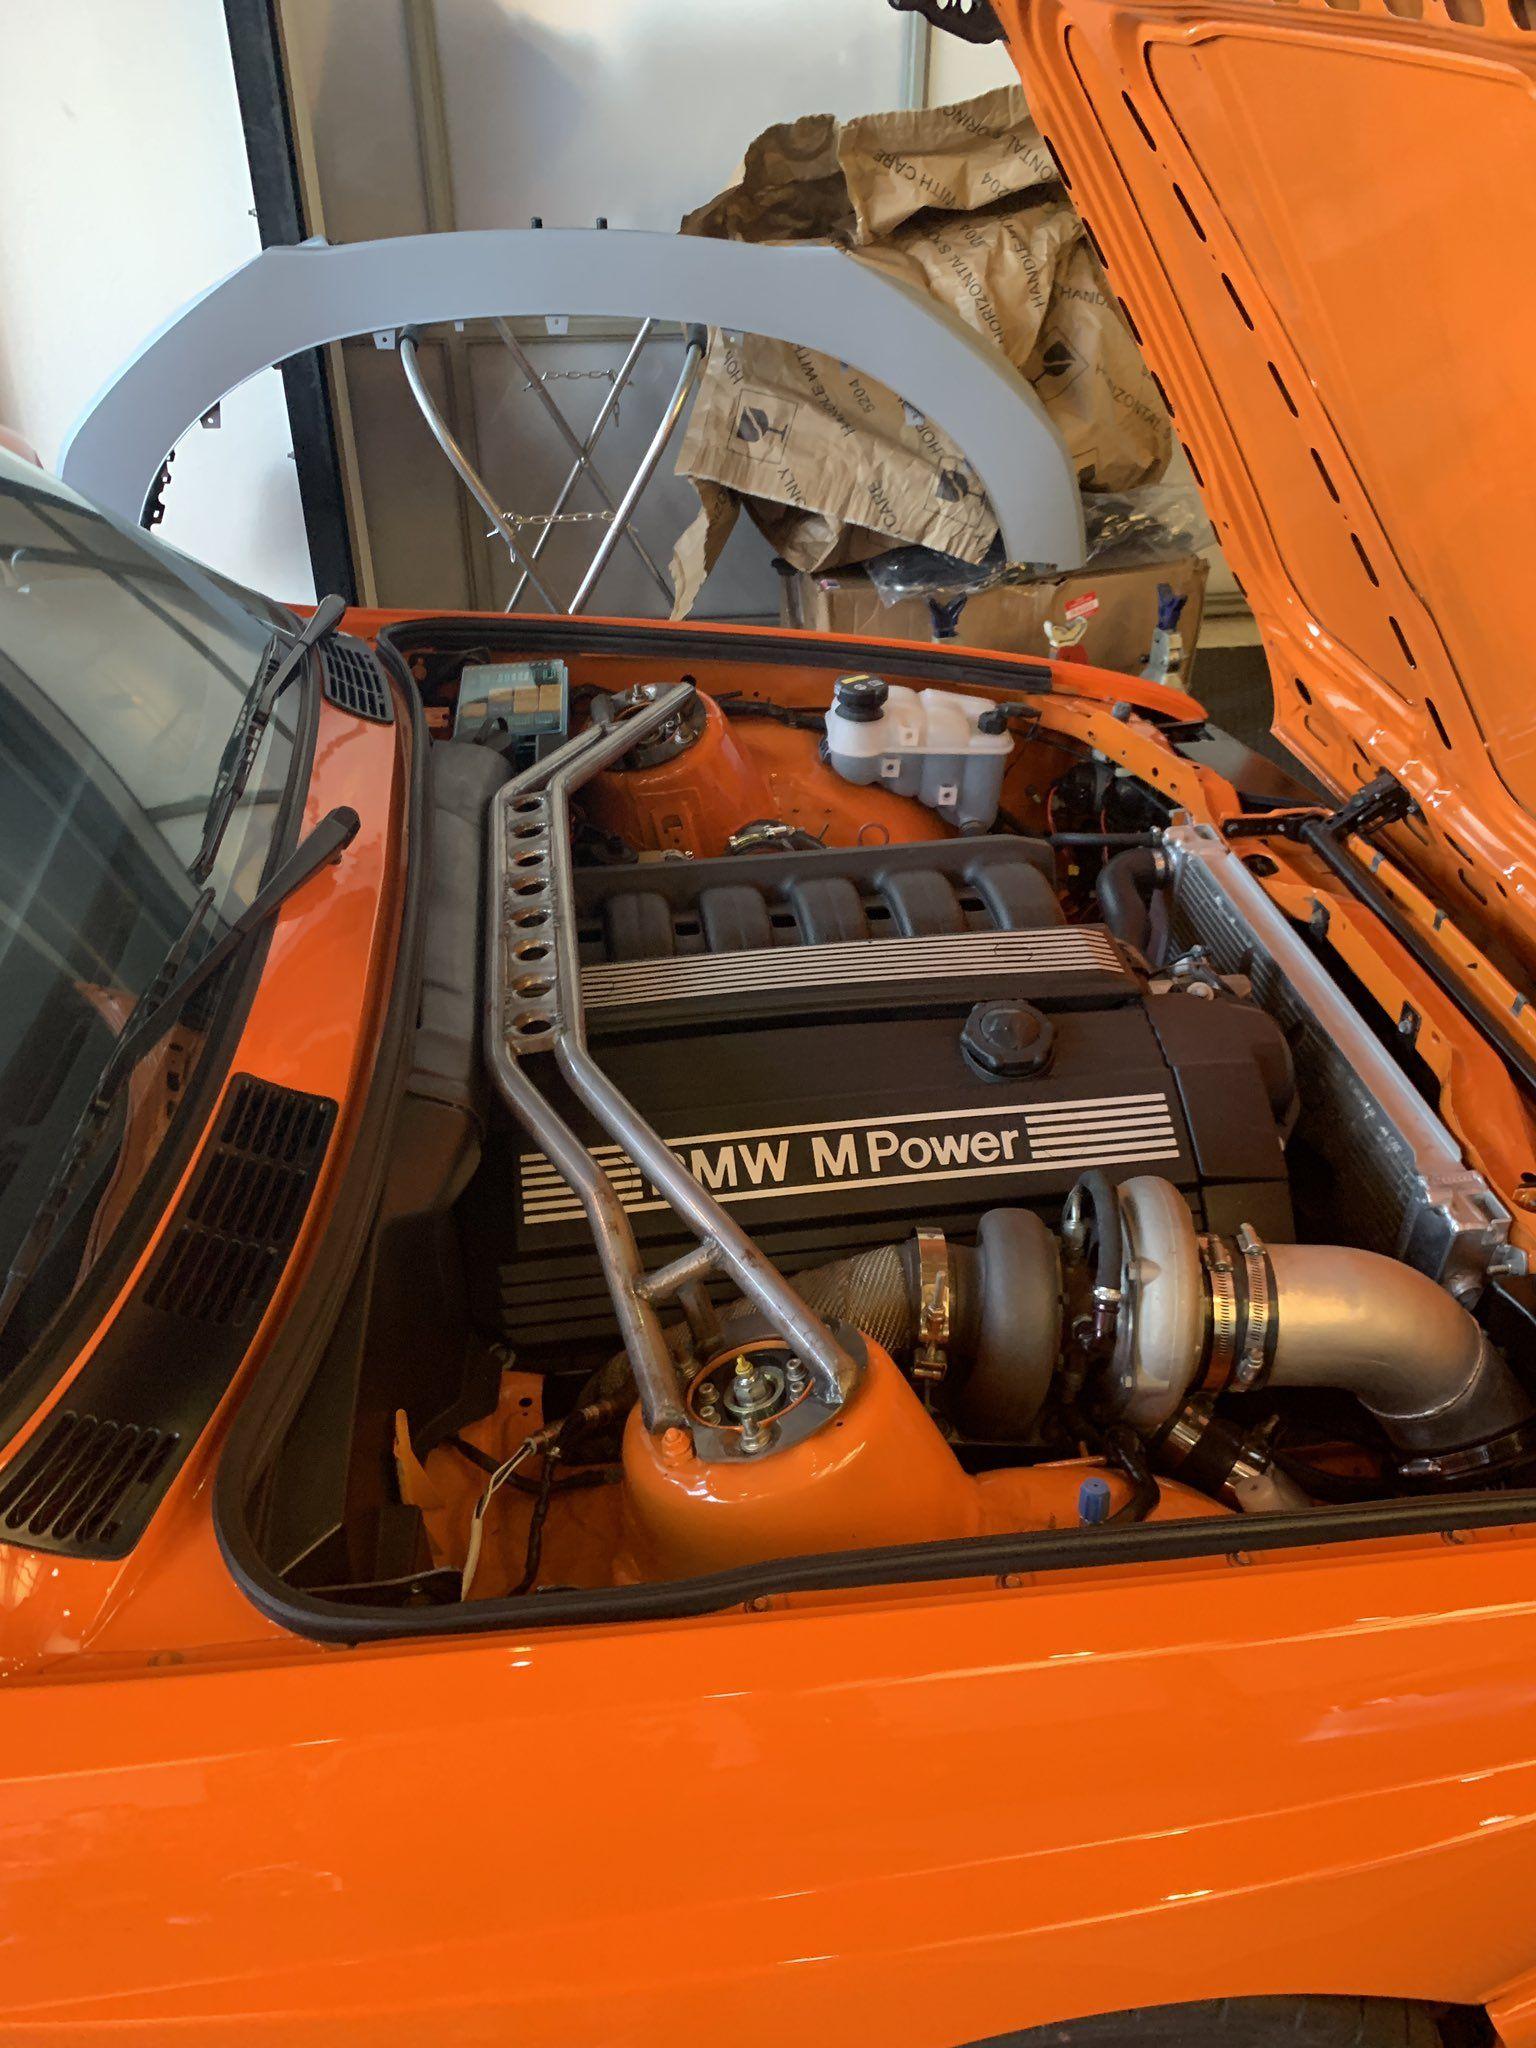 This E30 Engine Bay S52 Swapped With Images E30 Bmw E30 Bmw